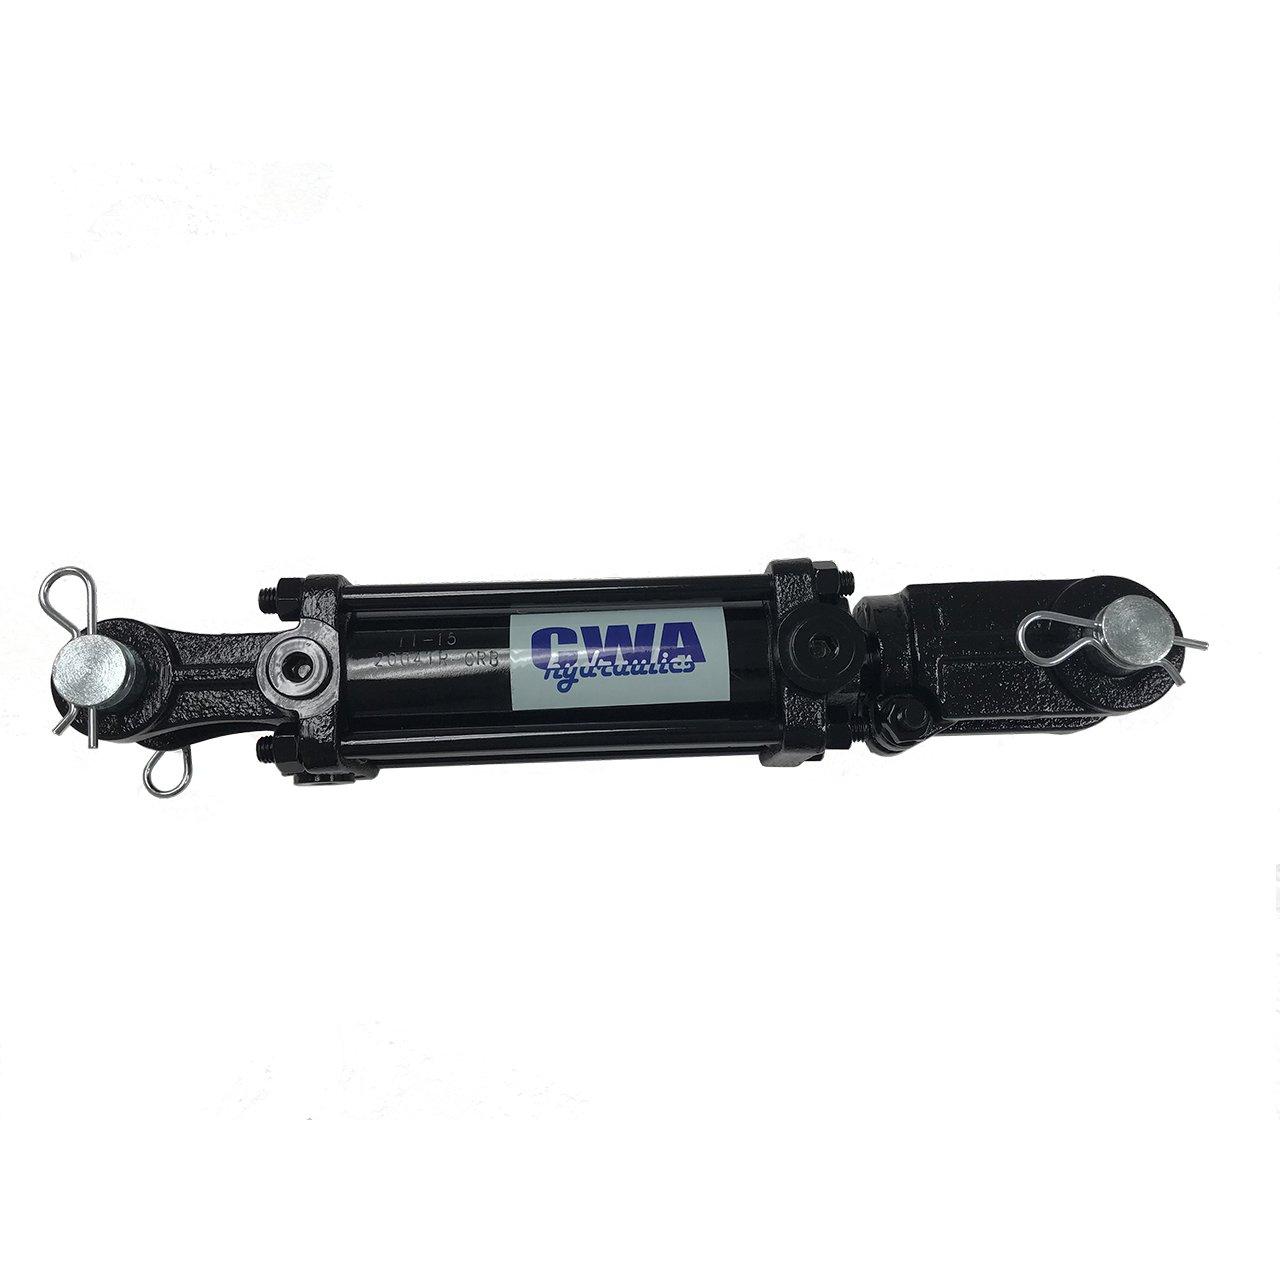 CWA Hydraulics TR Tie Rod Hydraulic Cylinder 3 1/2'' Bore x 36'' Stroke x 1 1/2'' Rod x SAE 8 Port x 2500 PSI